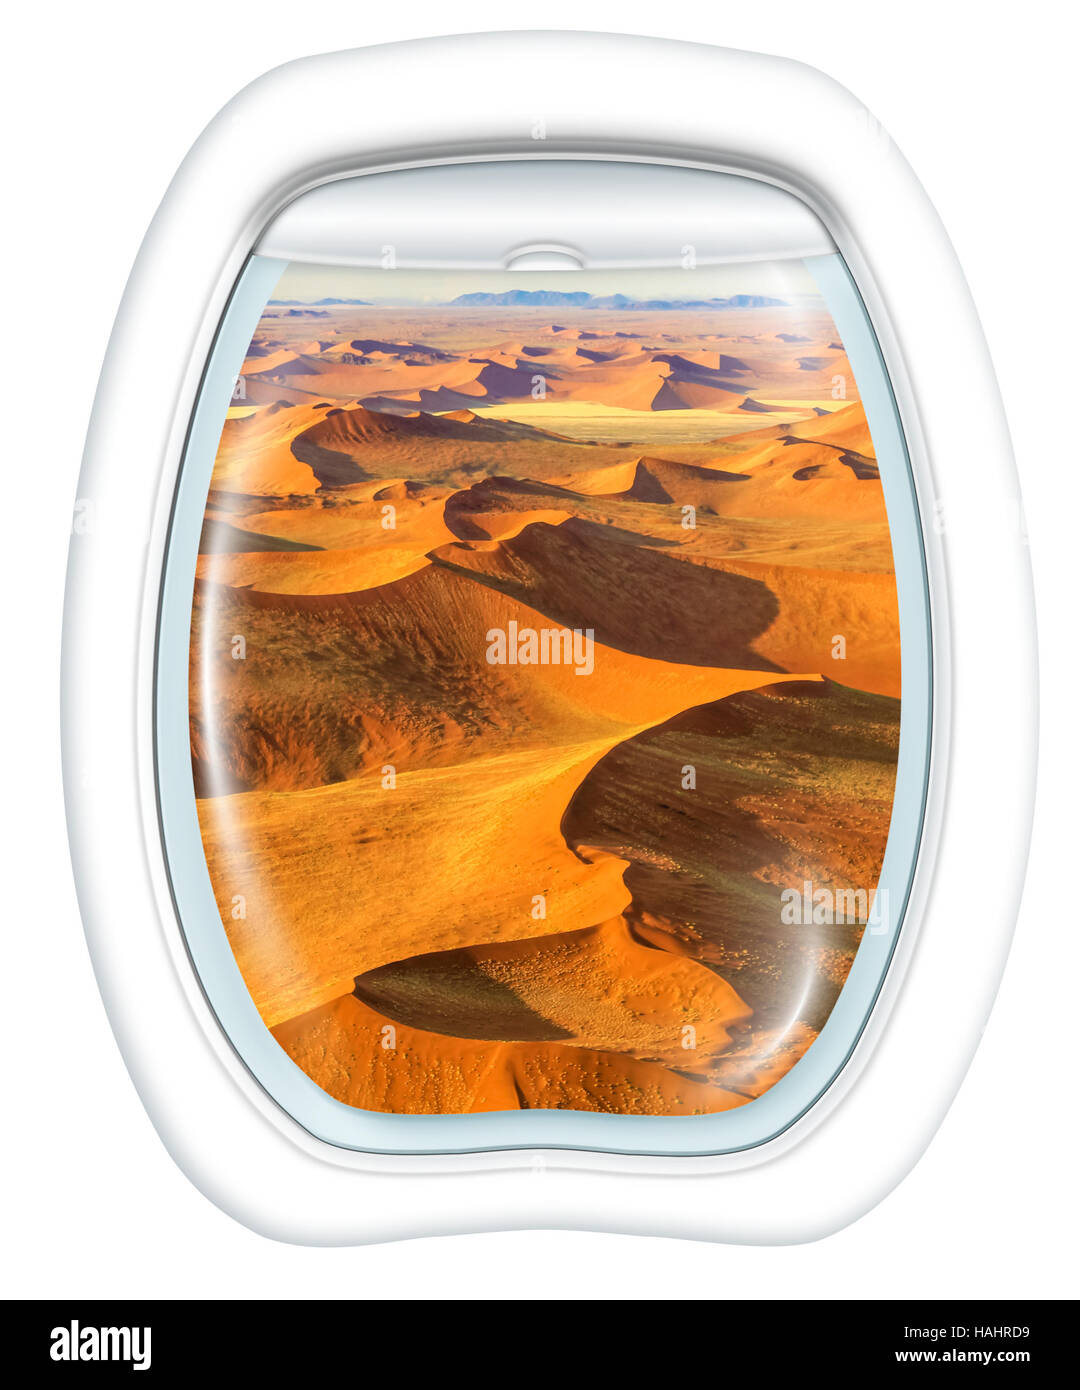 Scenic flight in Dead Valley - Stock Image